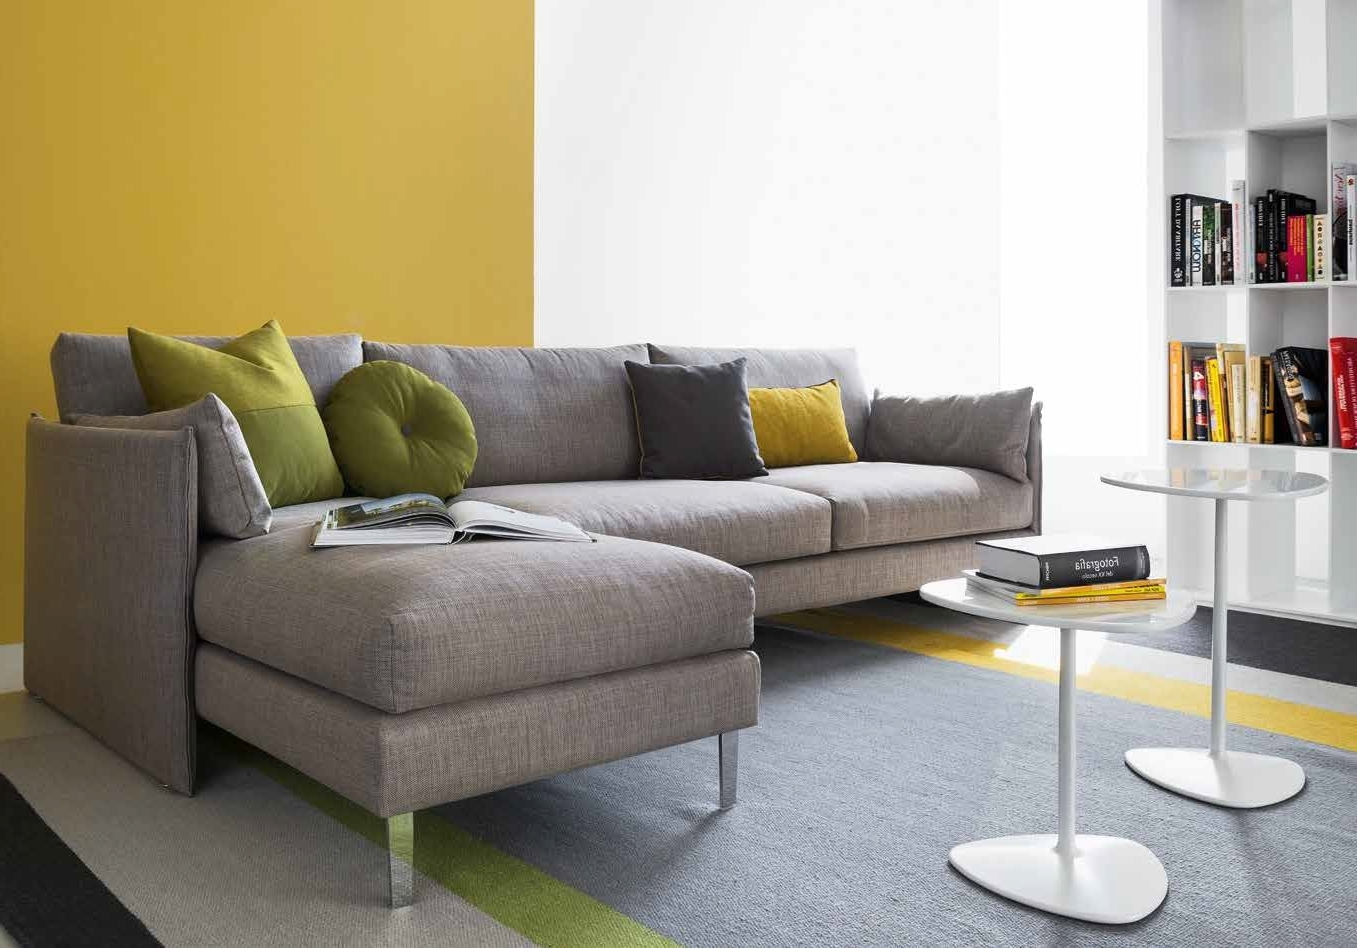 Urban Sectional Sofa Cs/3369, Calligaris Italy – Italmoda With Regard To Famous Nashua Nh Sectional Sofas (View 4 of 20)